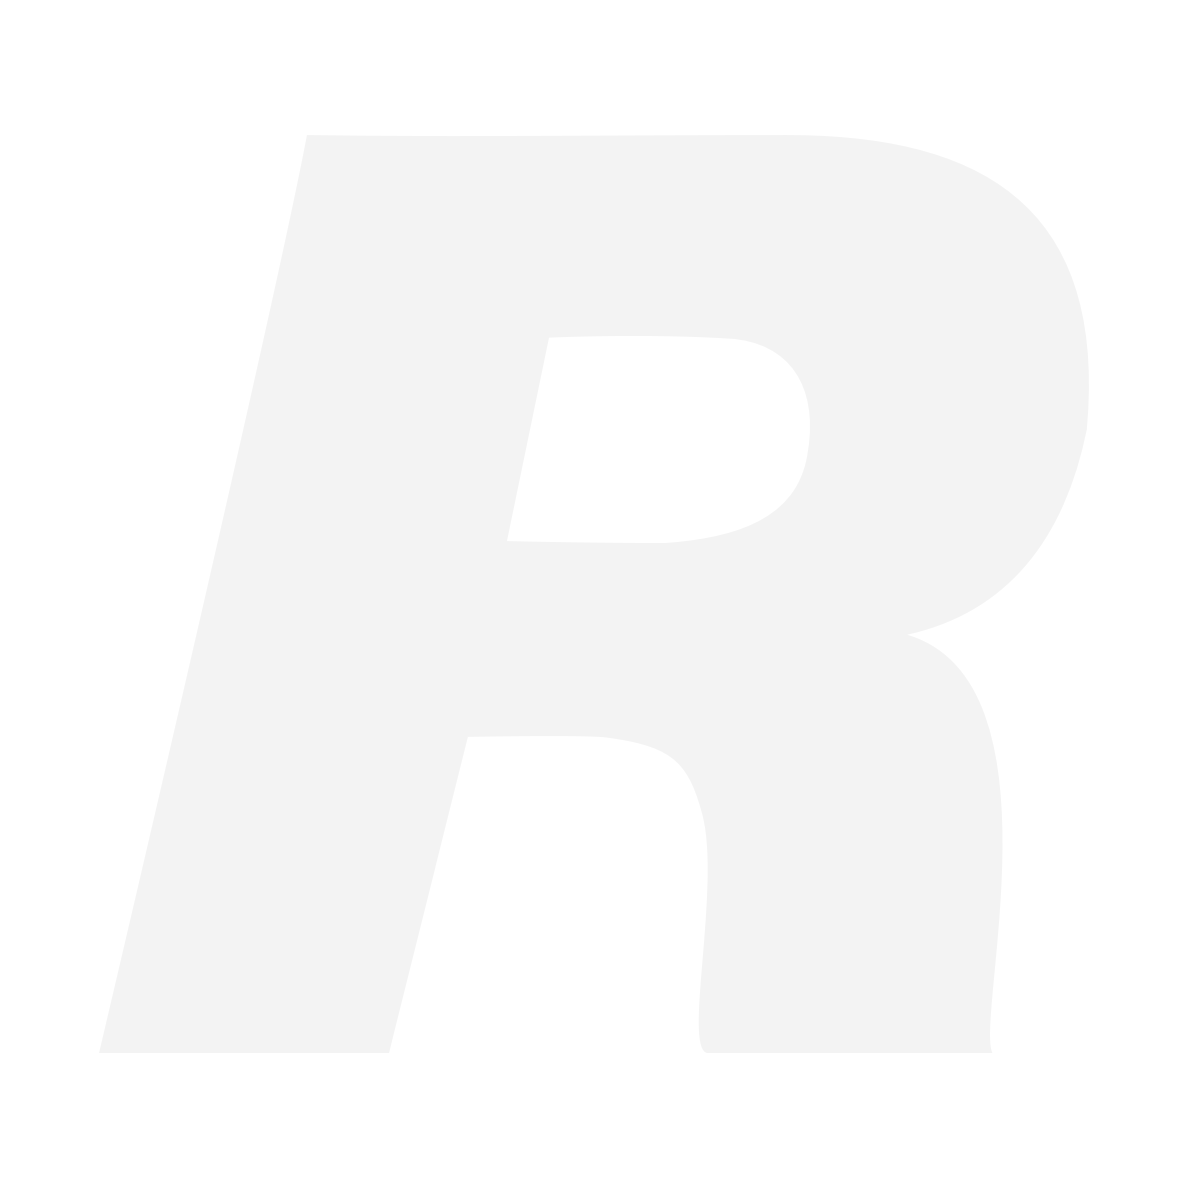 NiSi Squarefilter Nano IR GND8 Reverse 100x150mm